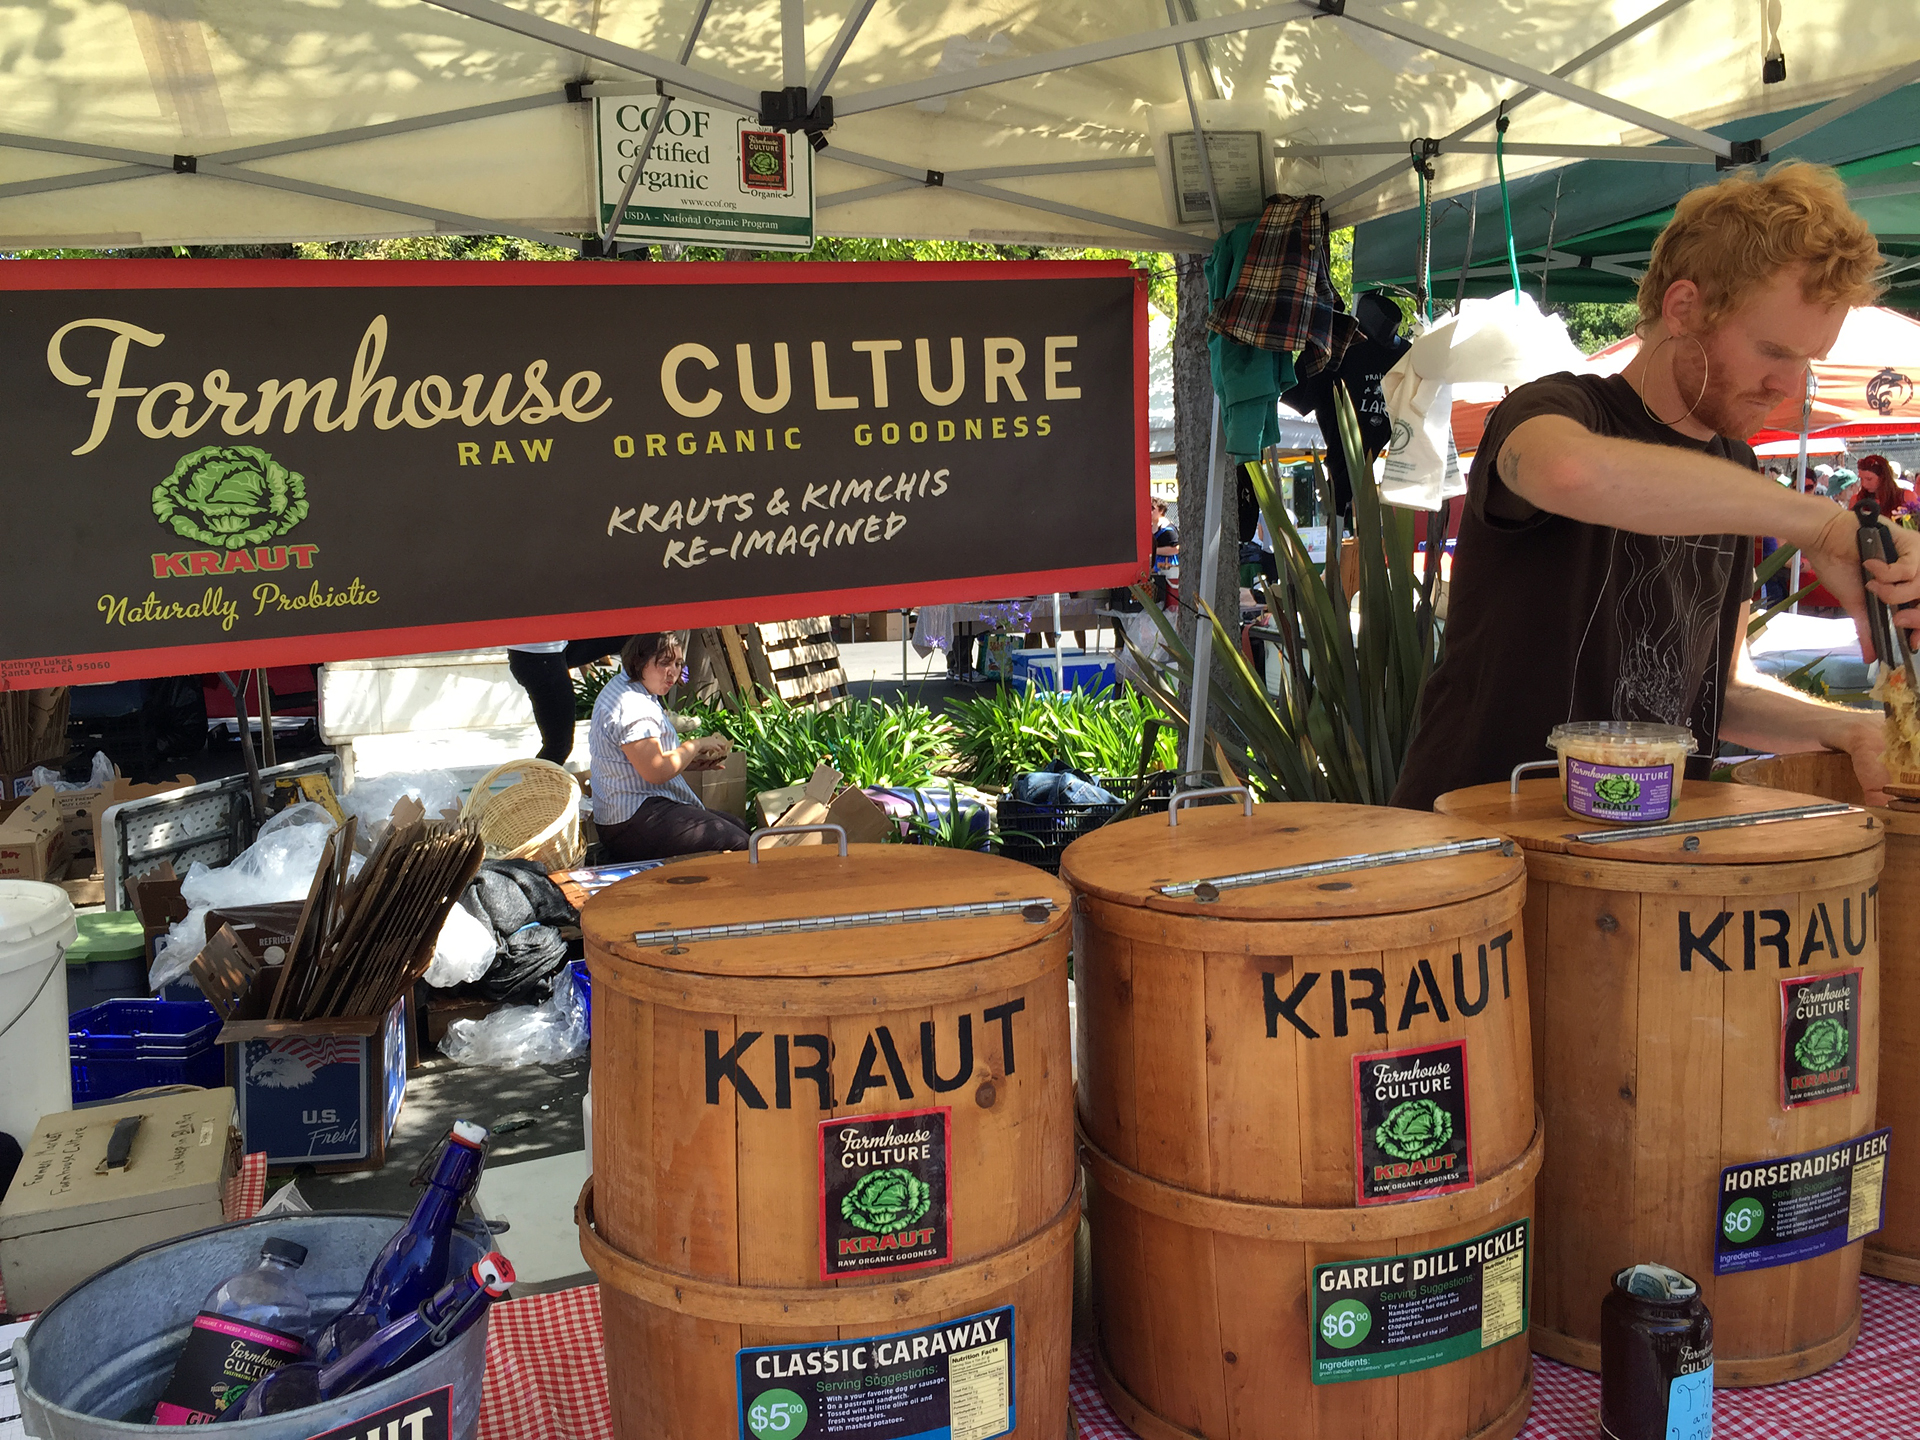 Farmhouse Culture of Santa Cruz at the Temescal Farmers' Market in Oakland